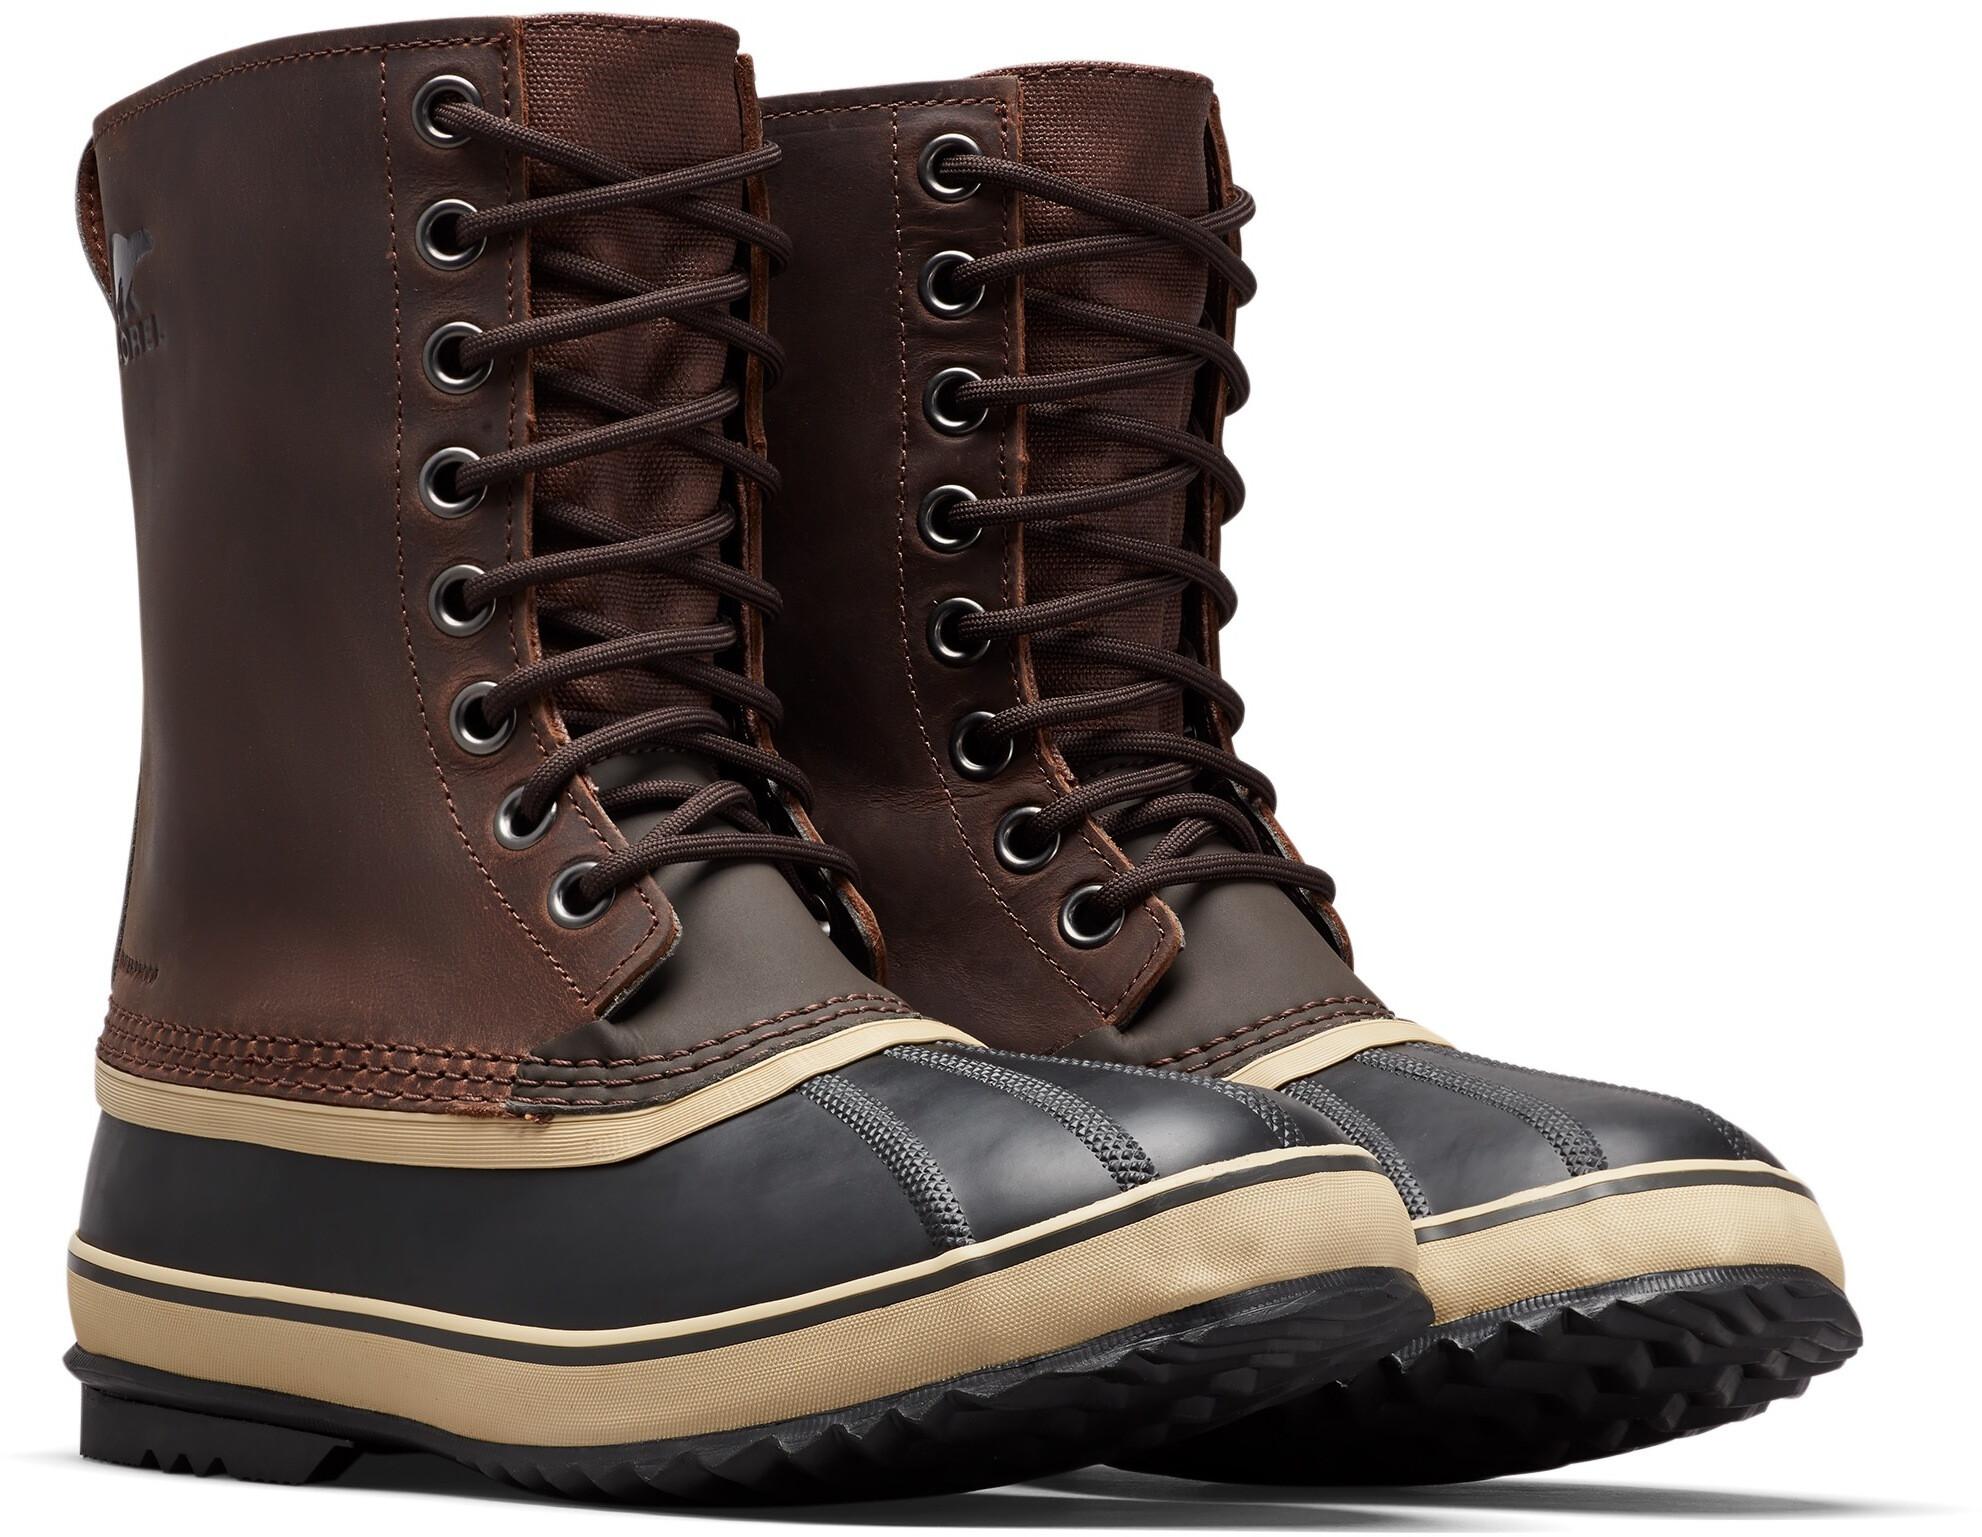 Sorel NIB 7 8.5 9.5 Cate Tall Waterproof Leather Suede Boot